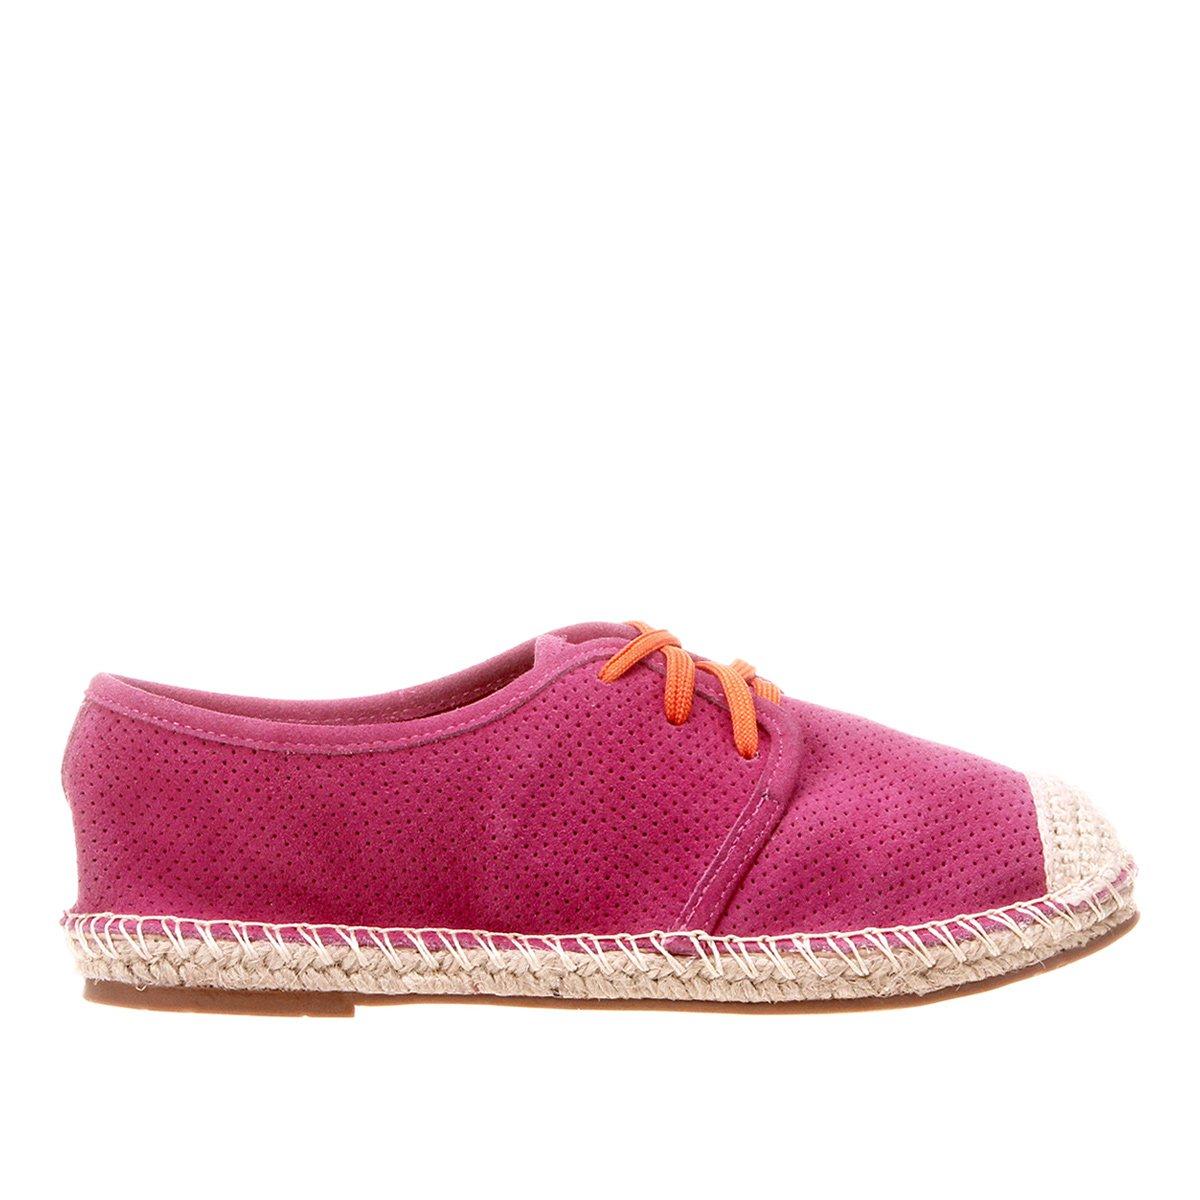 Corda Pink Furinhos Lilly's Closet Tênis Lilly's Tênis IxqaYHY8